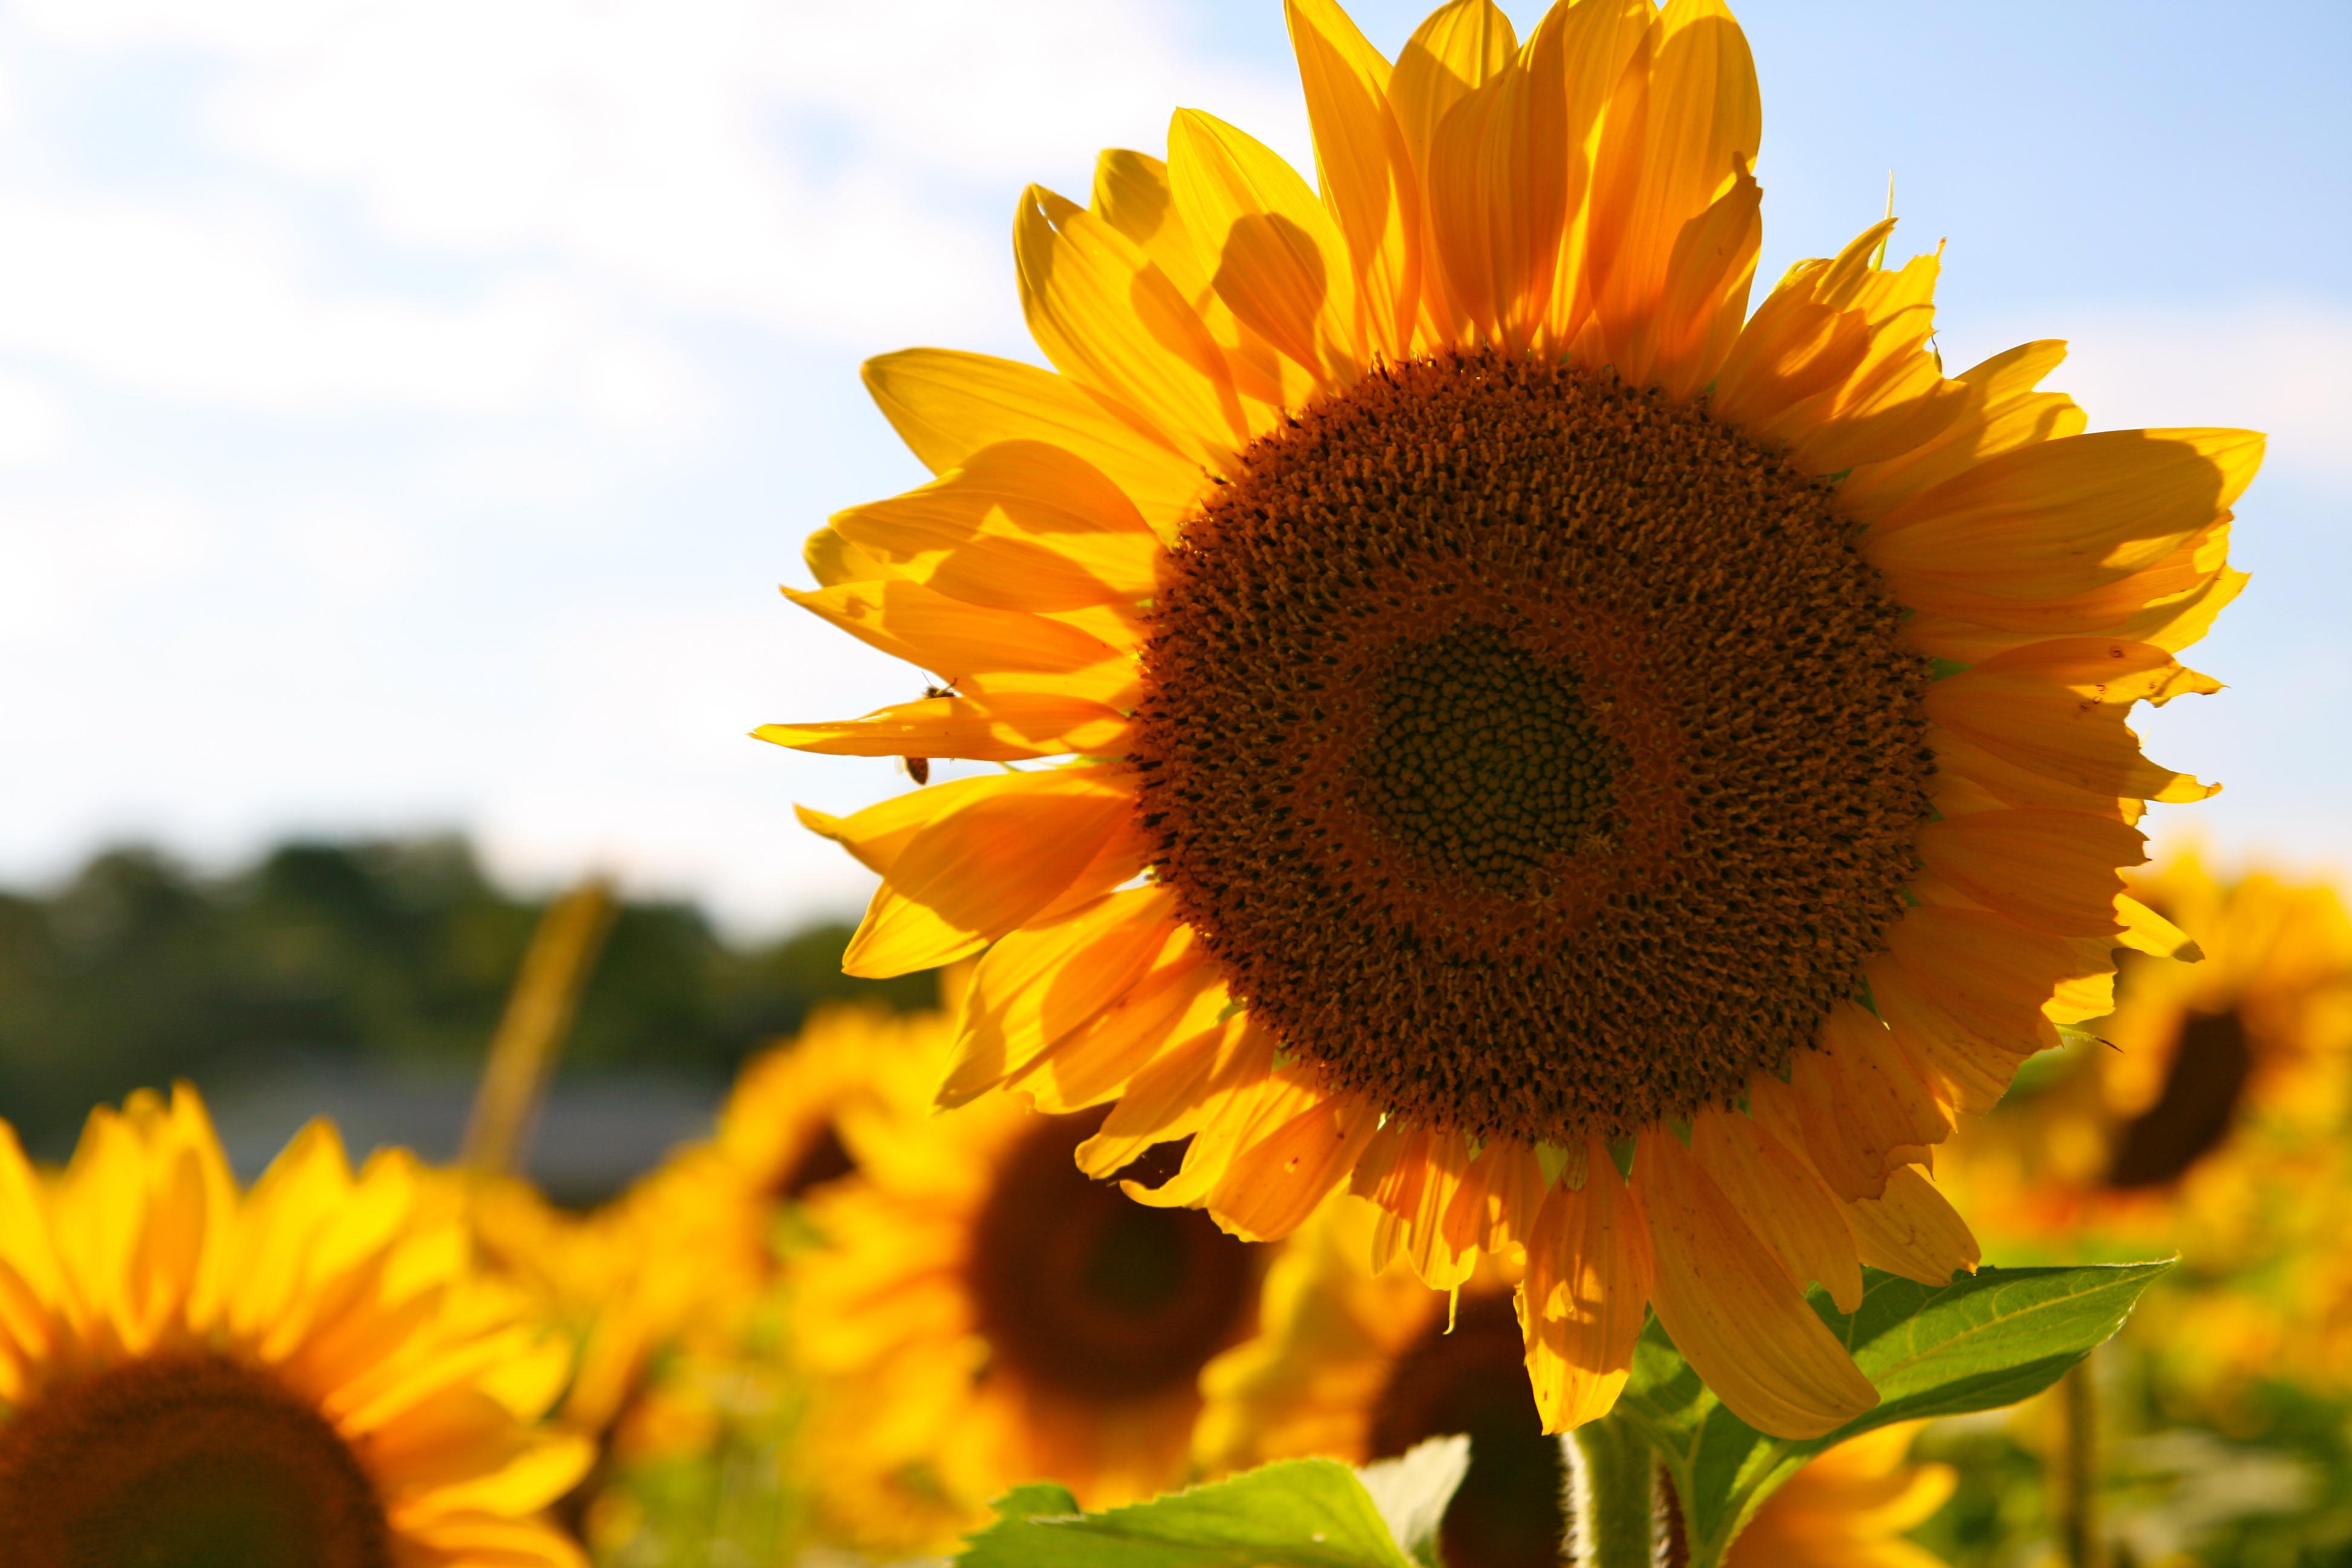 Yellow Brown Sun Flower During Daytime 183 Free Stock Photo